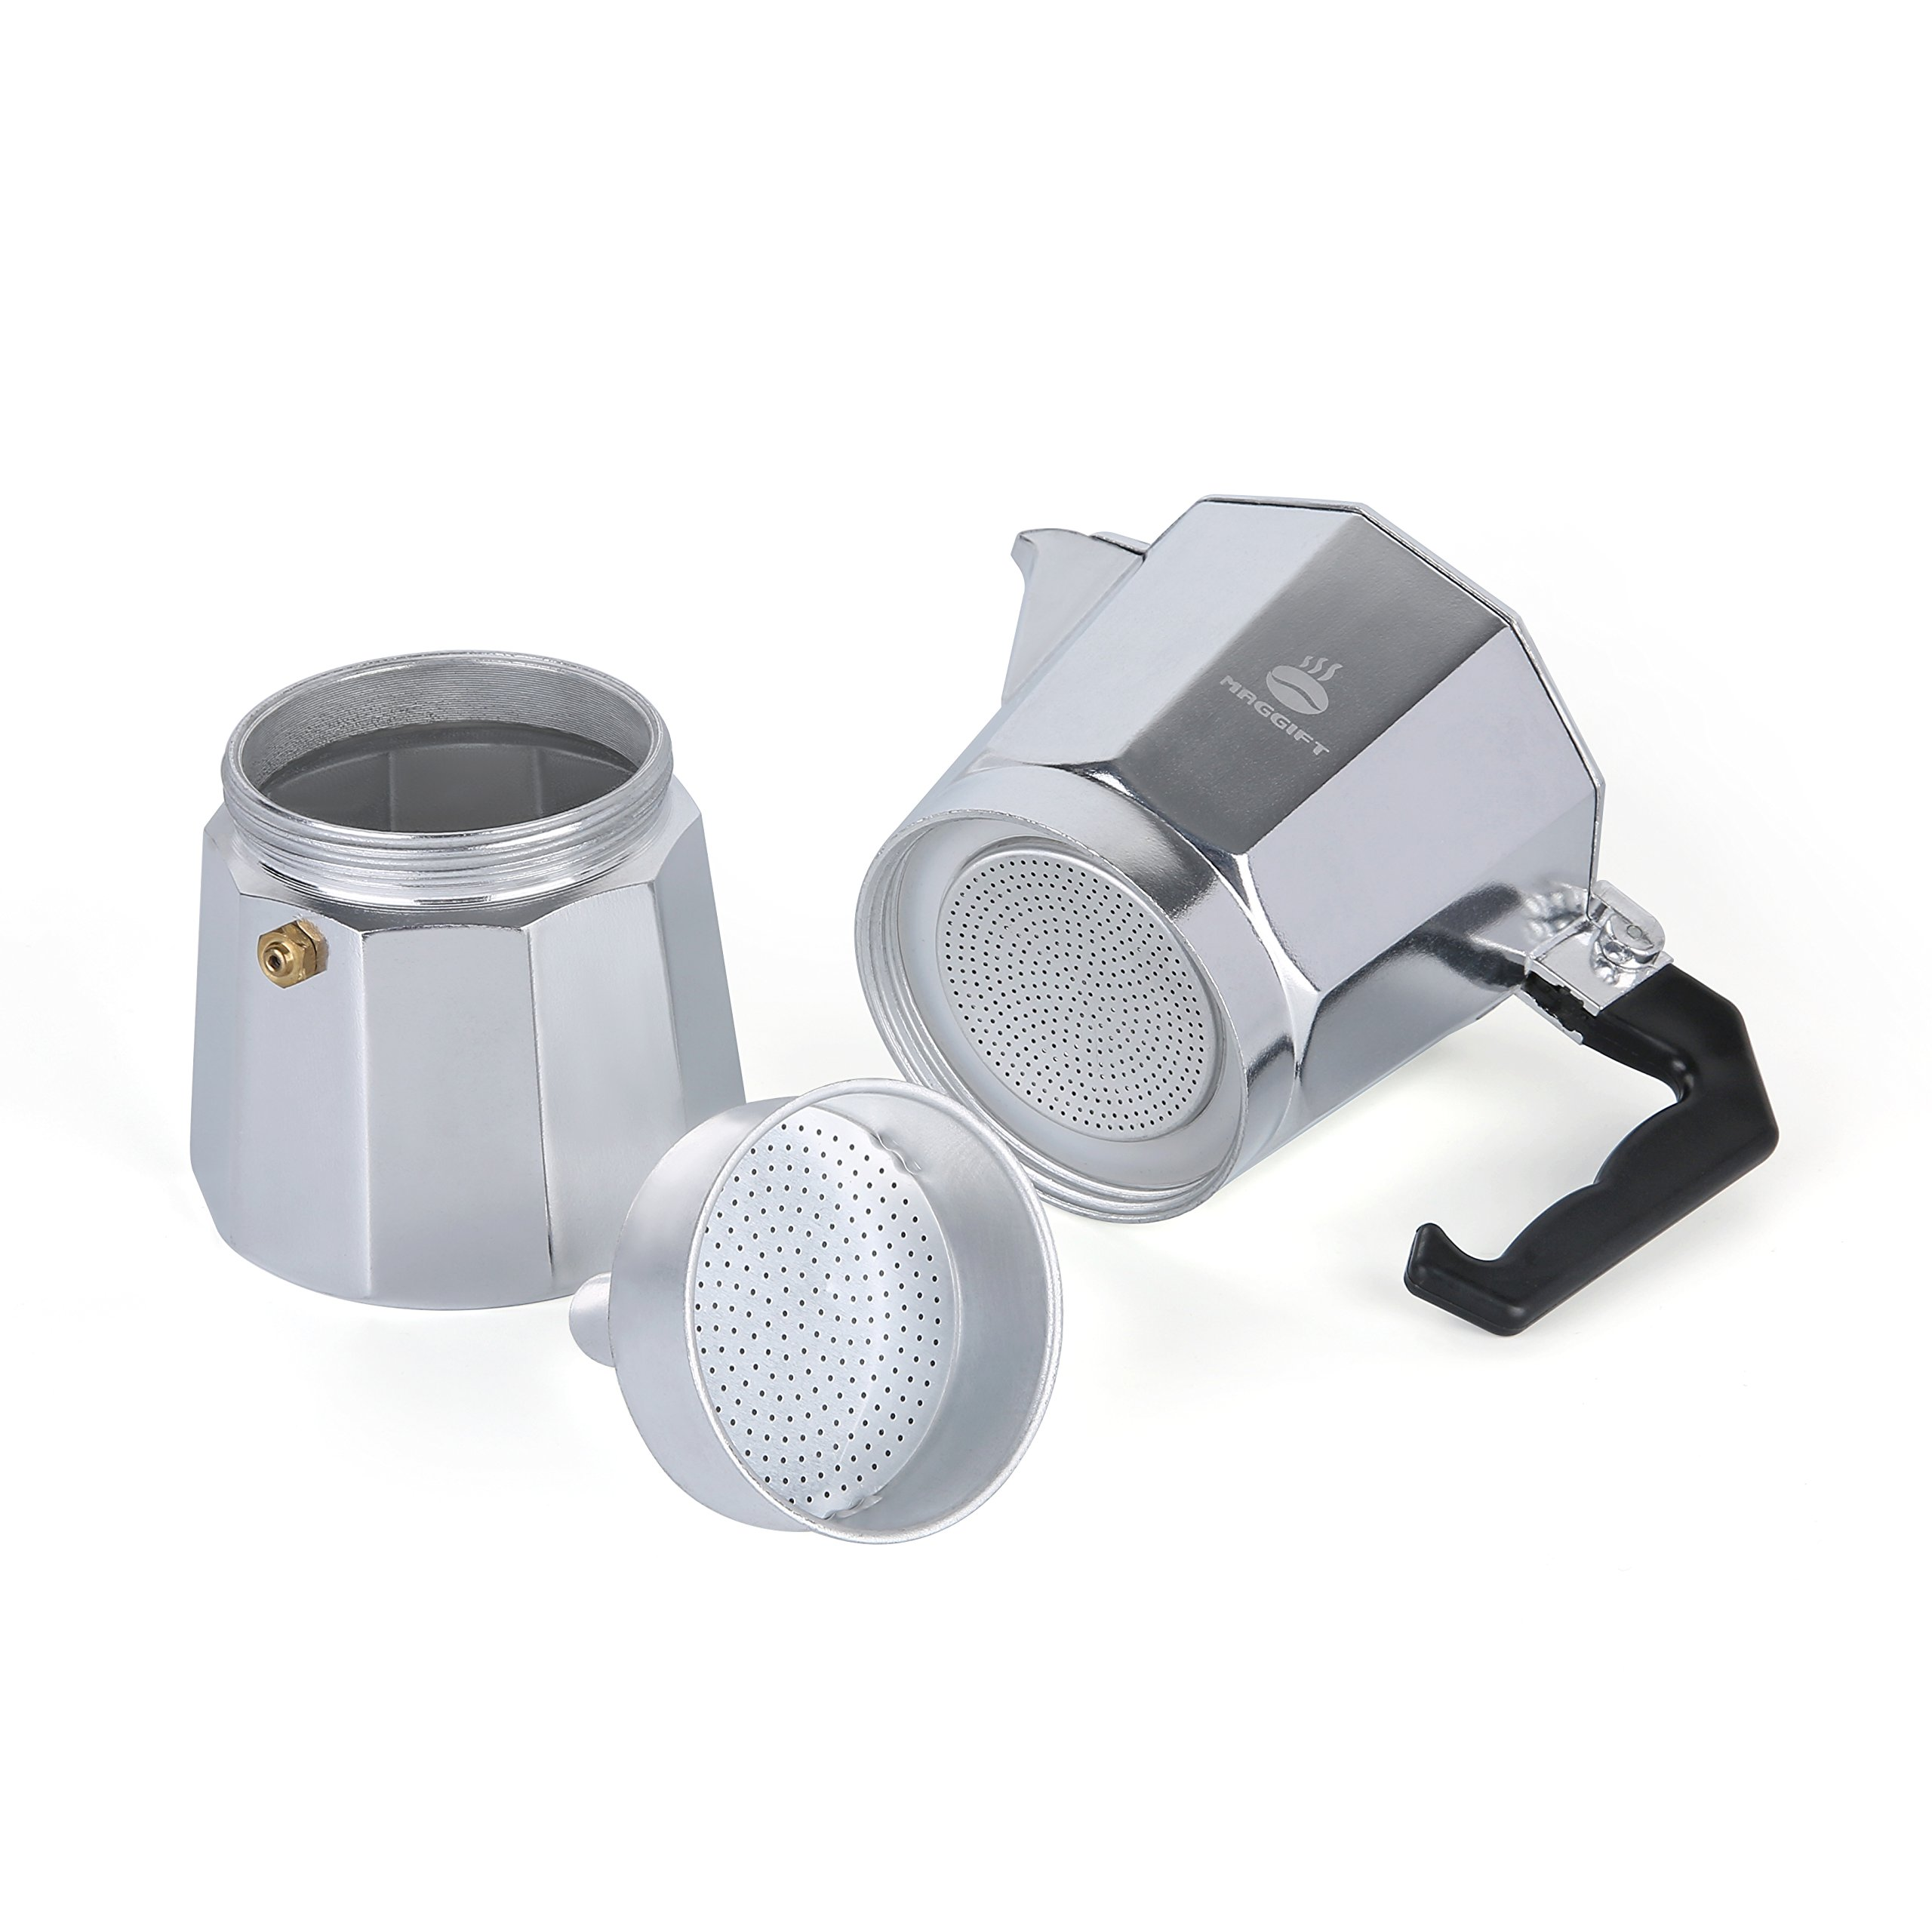 Maggift Stovetop Coffee Maker, Aluminum Italian Moka Pot (6 Cup) by Maggift (Image #3)